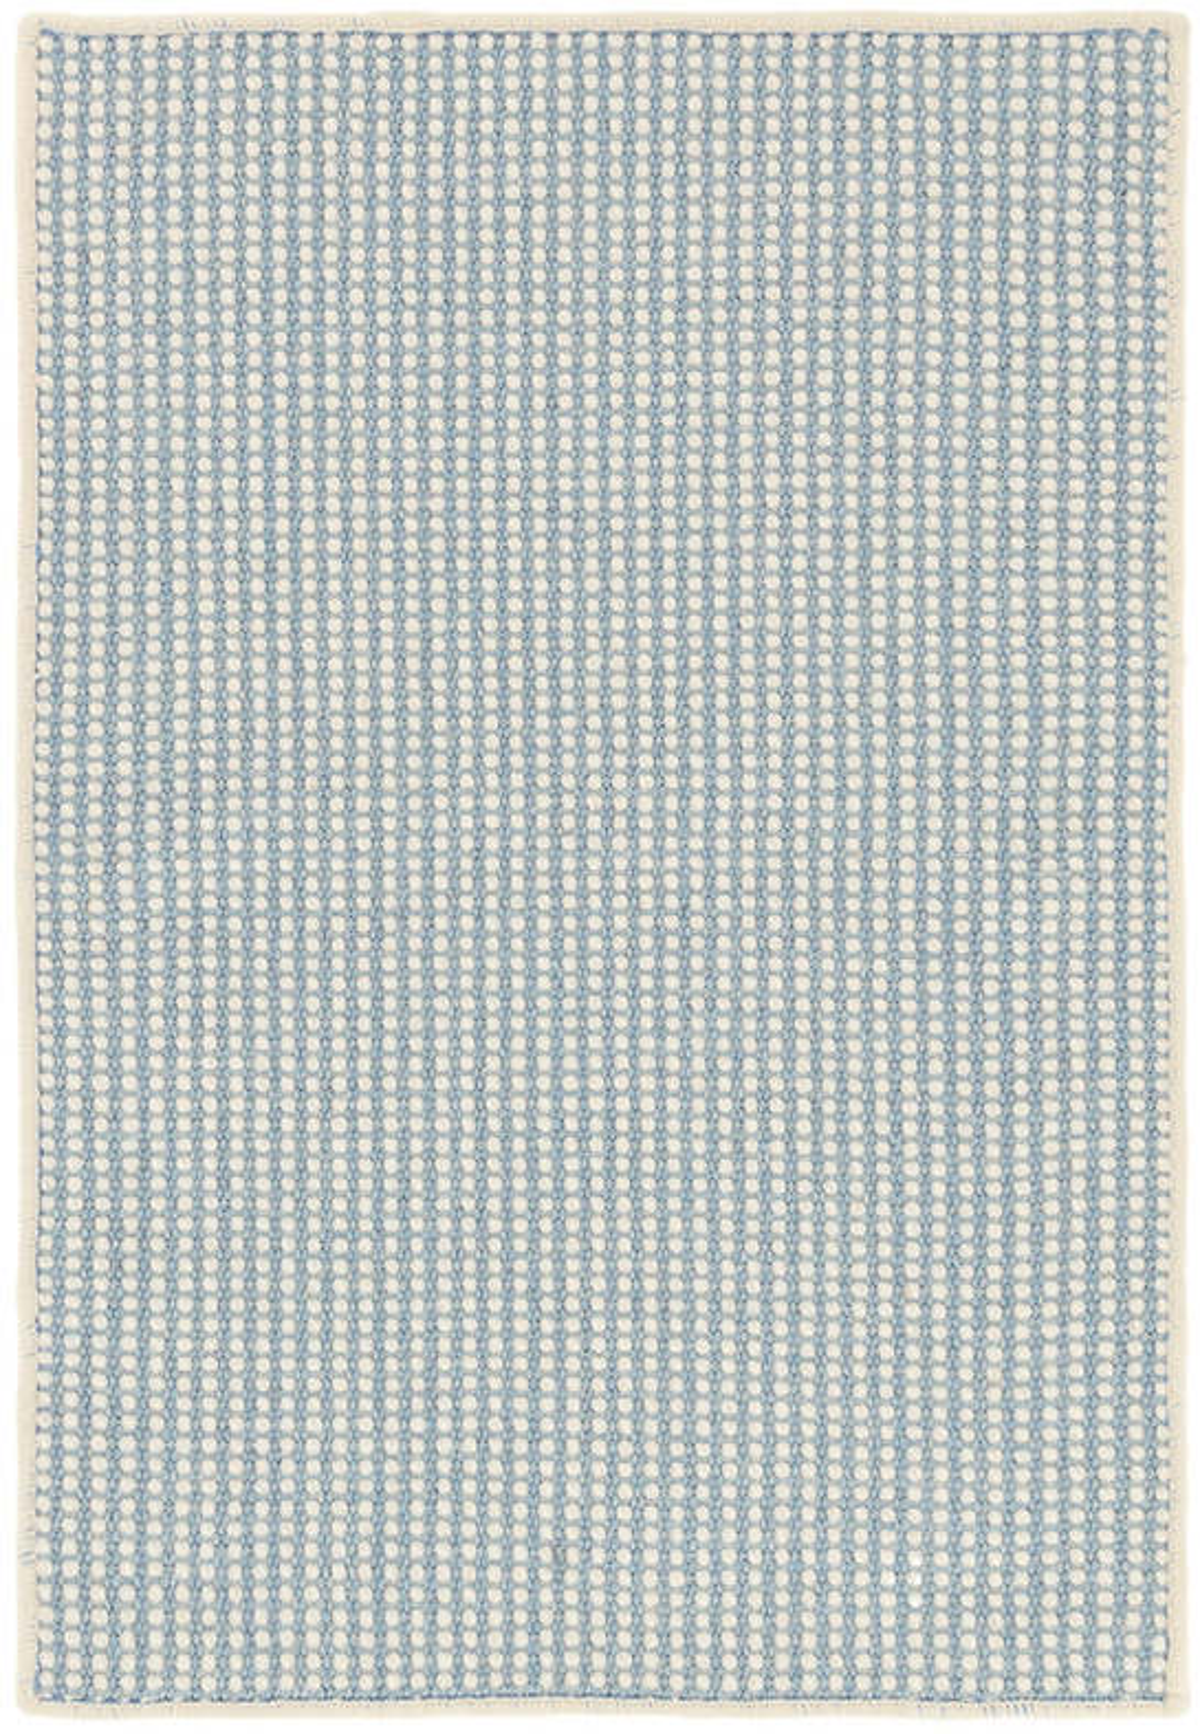 Pixel Sky Woven Sisal/Wool Rug